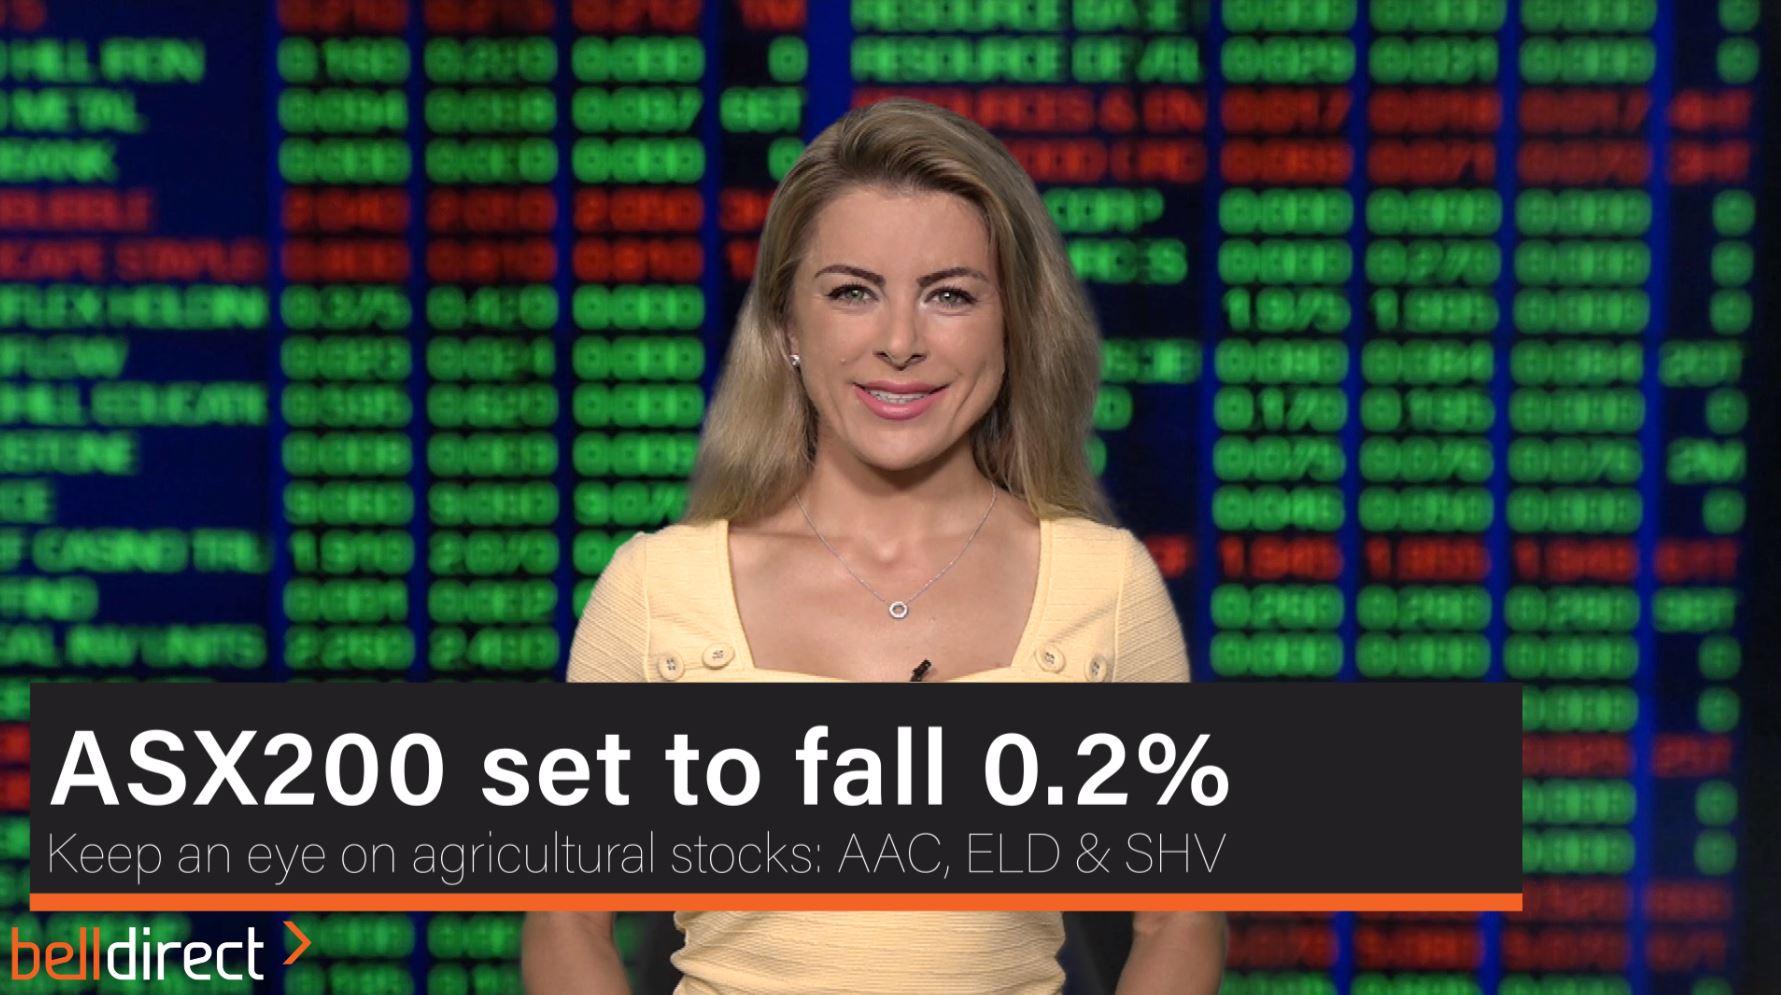 ASX200 set to fall 0.2%